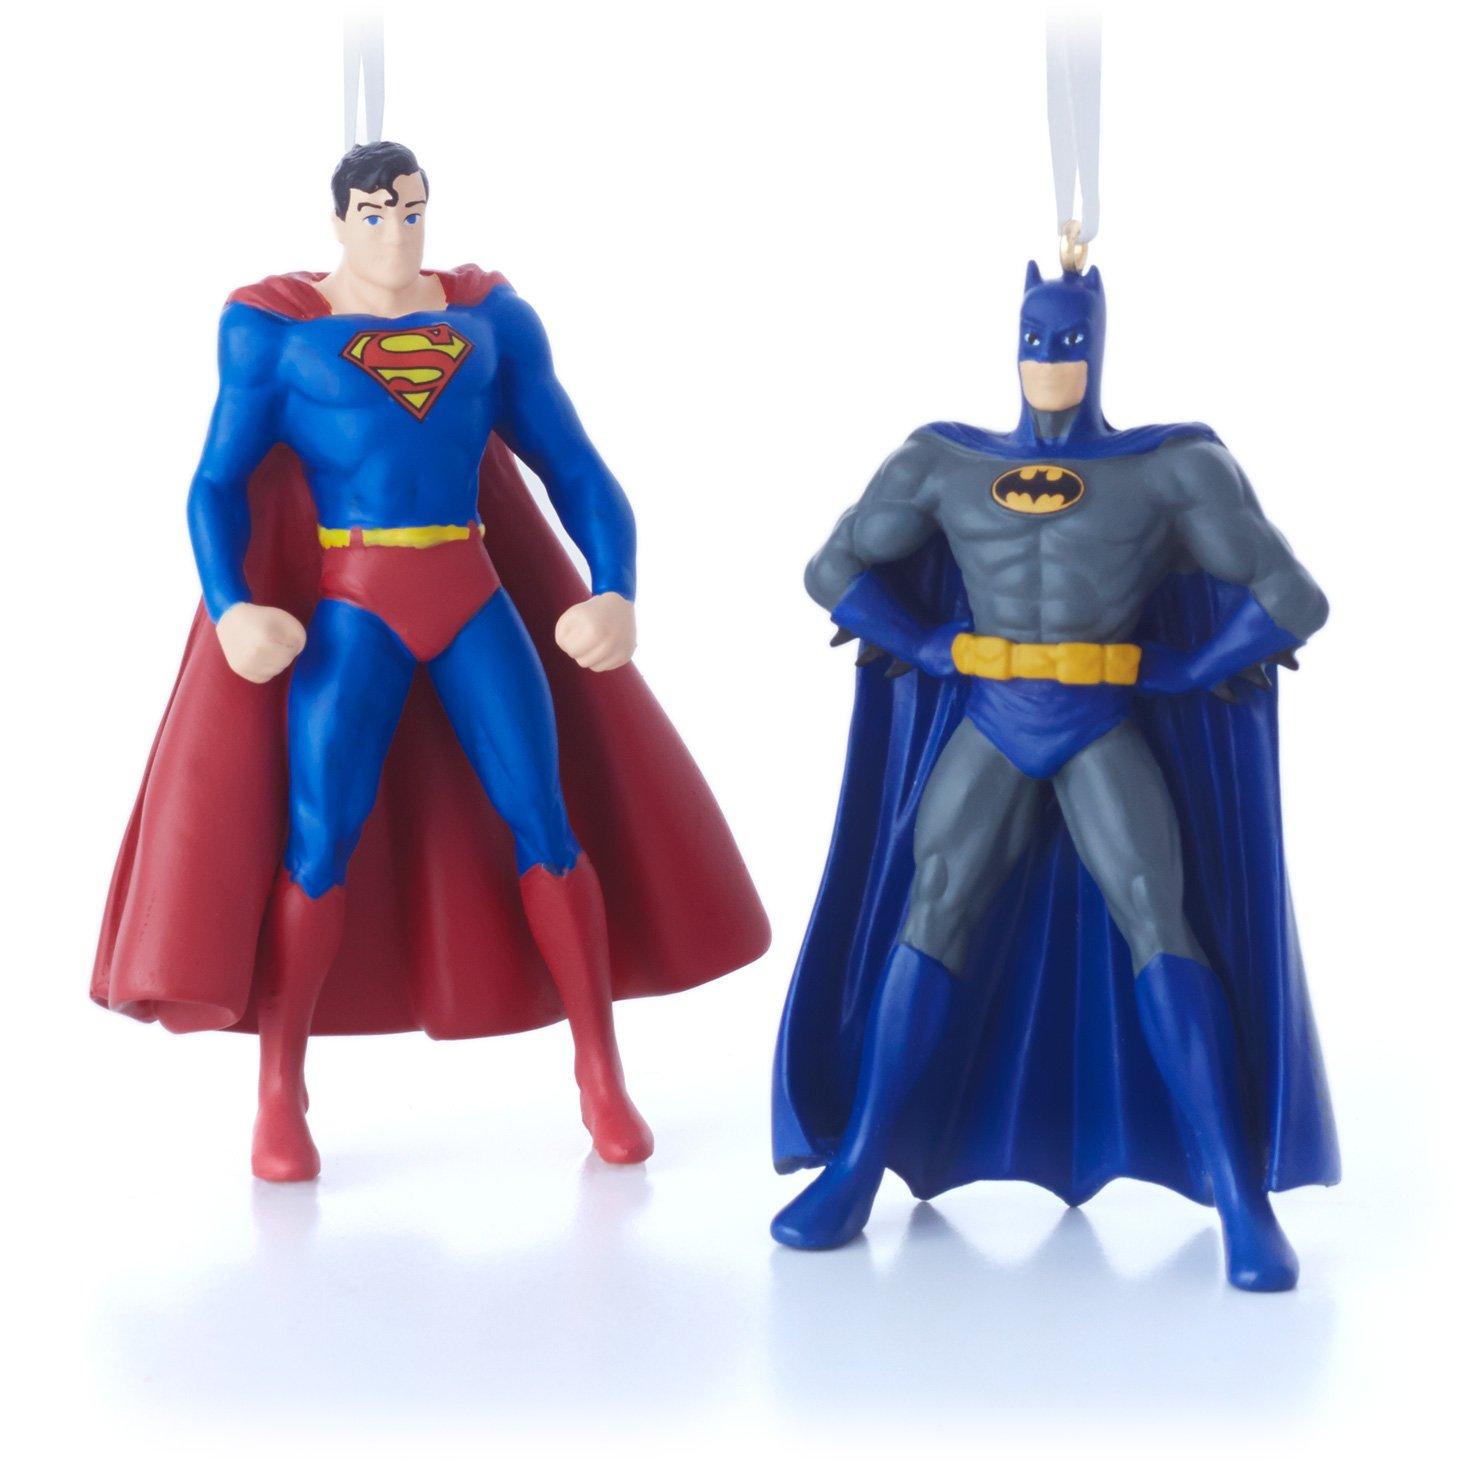 Amazon.com: Hallmark DC Comics Superman and Batman Christmas ...